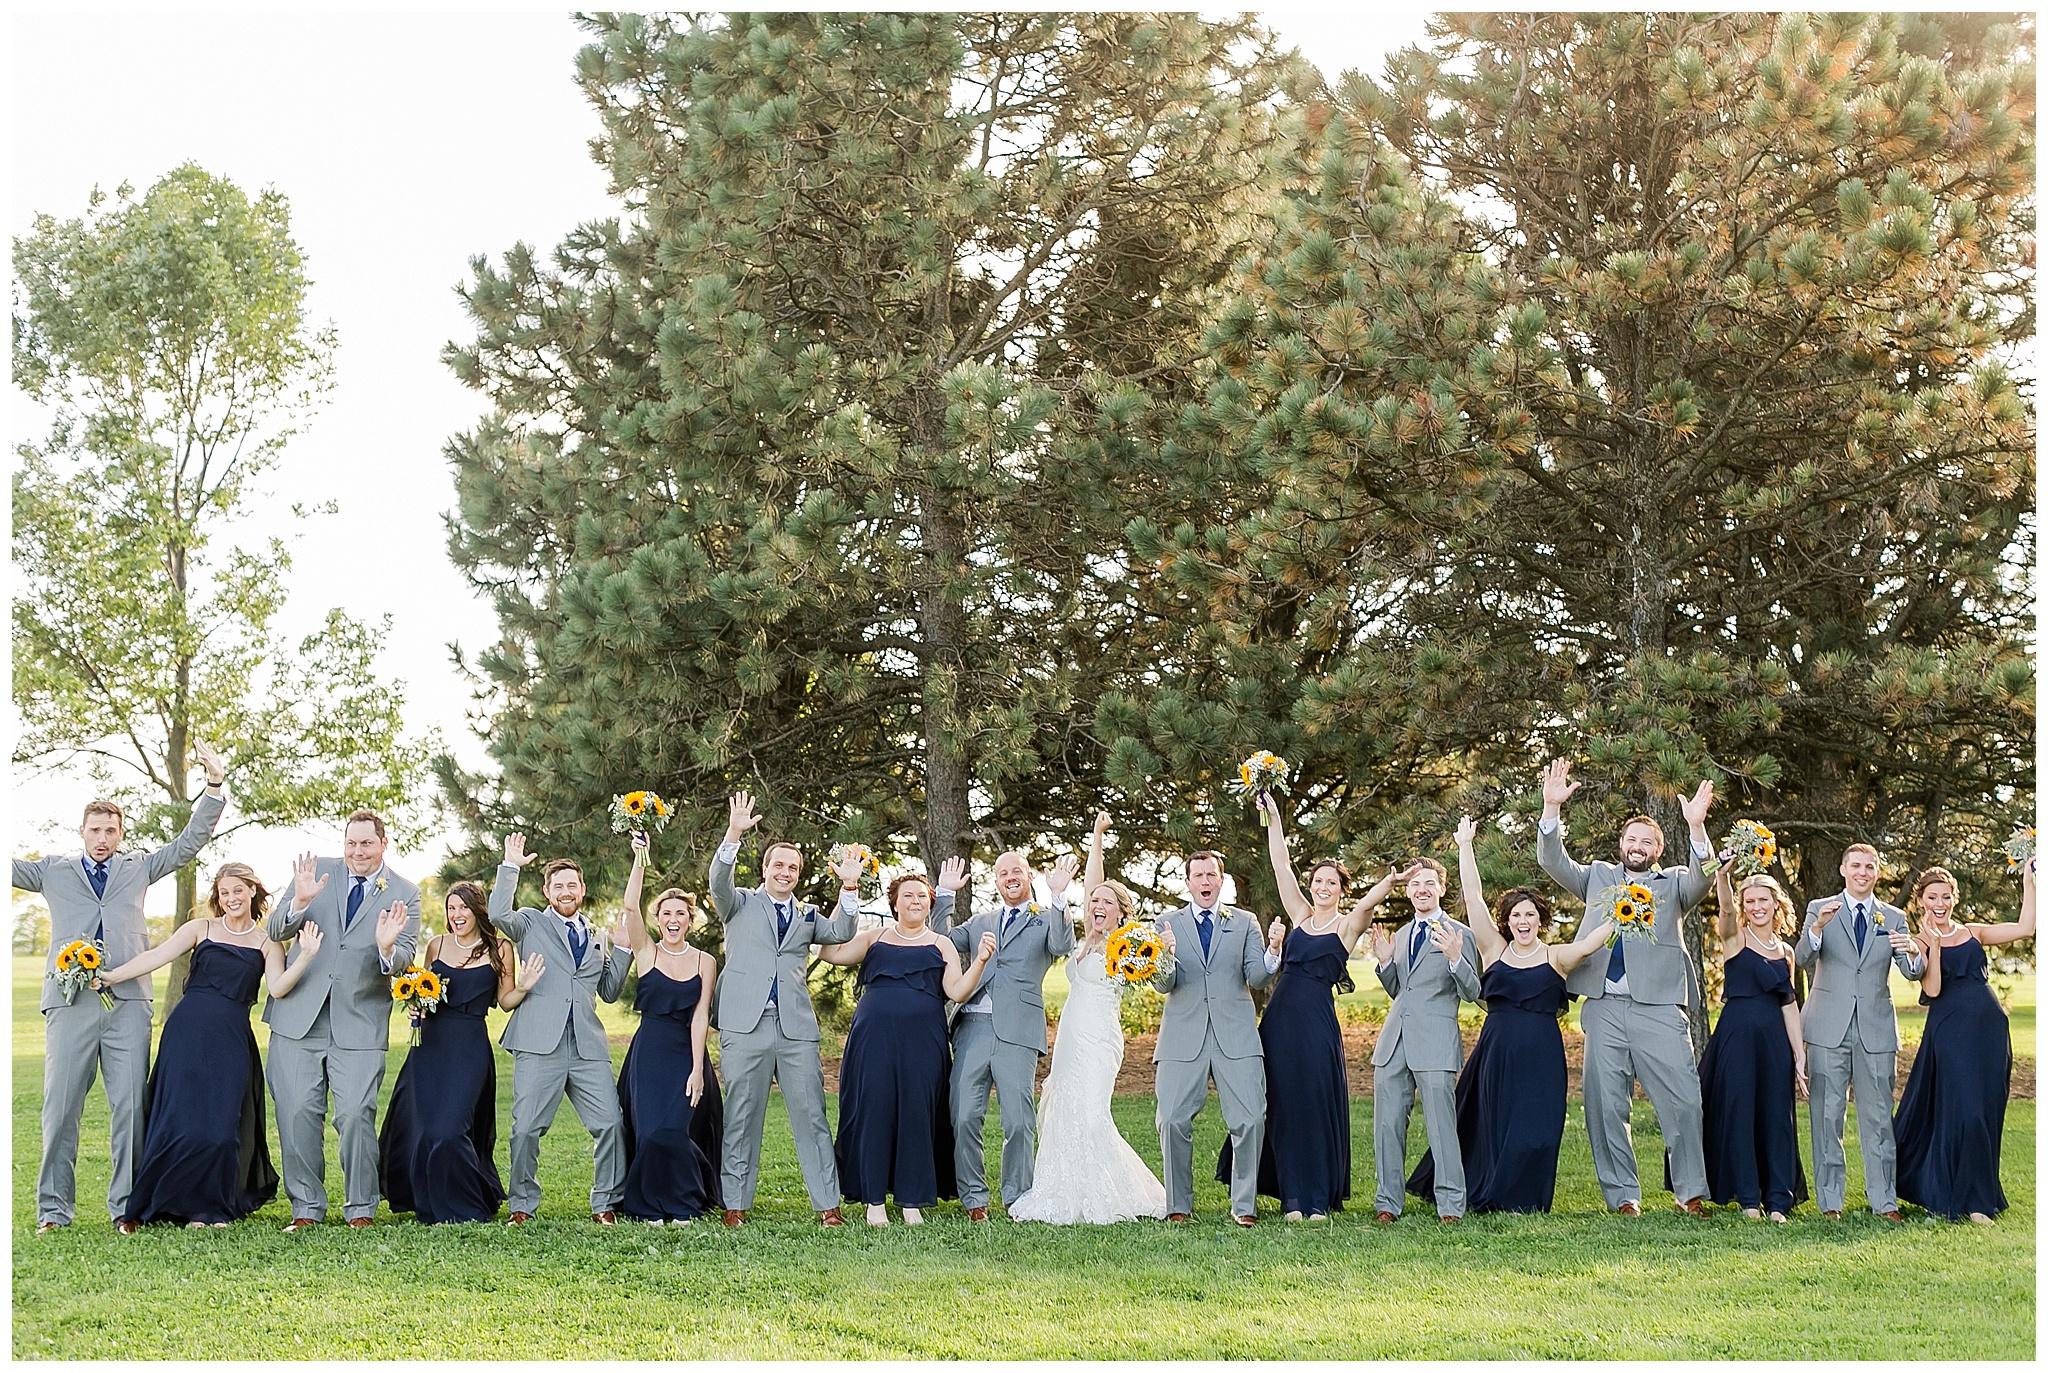 Venue_at_Milwaukee_Brewing_Company_wedding_milwaukee_wisconsin_0345.jpg